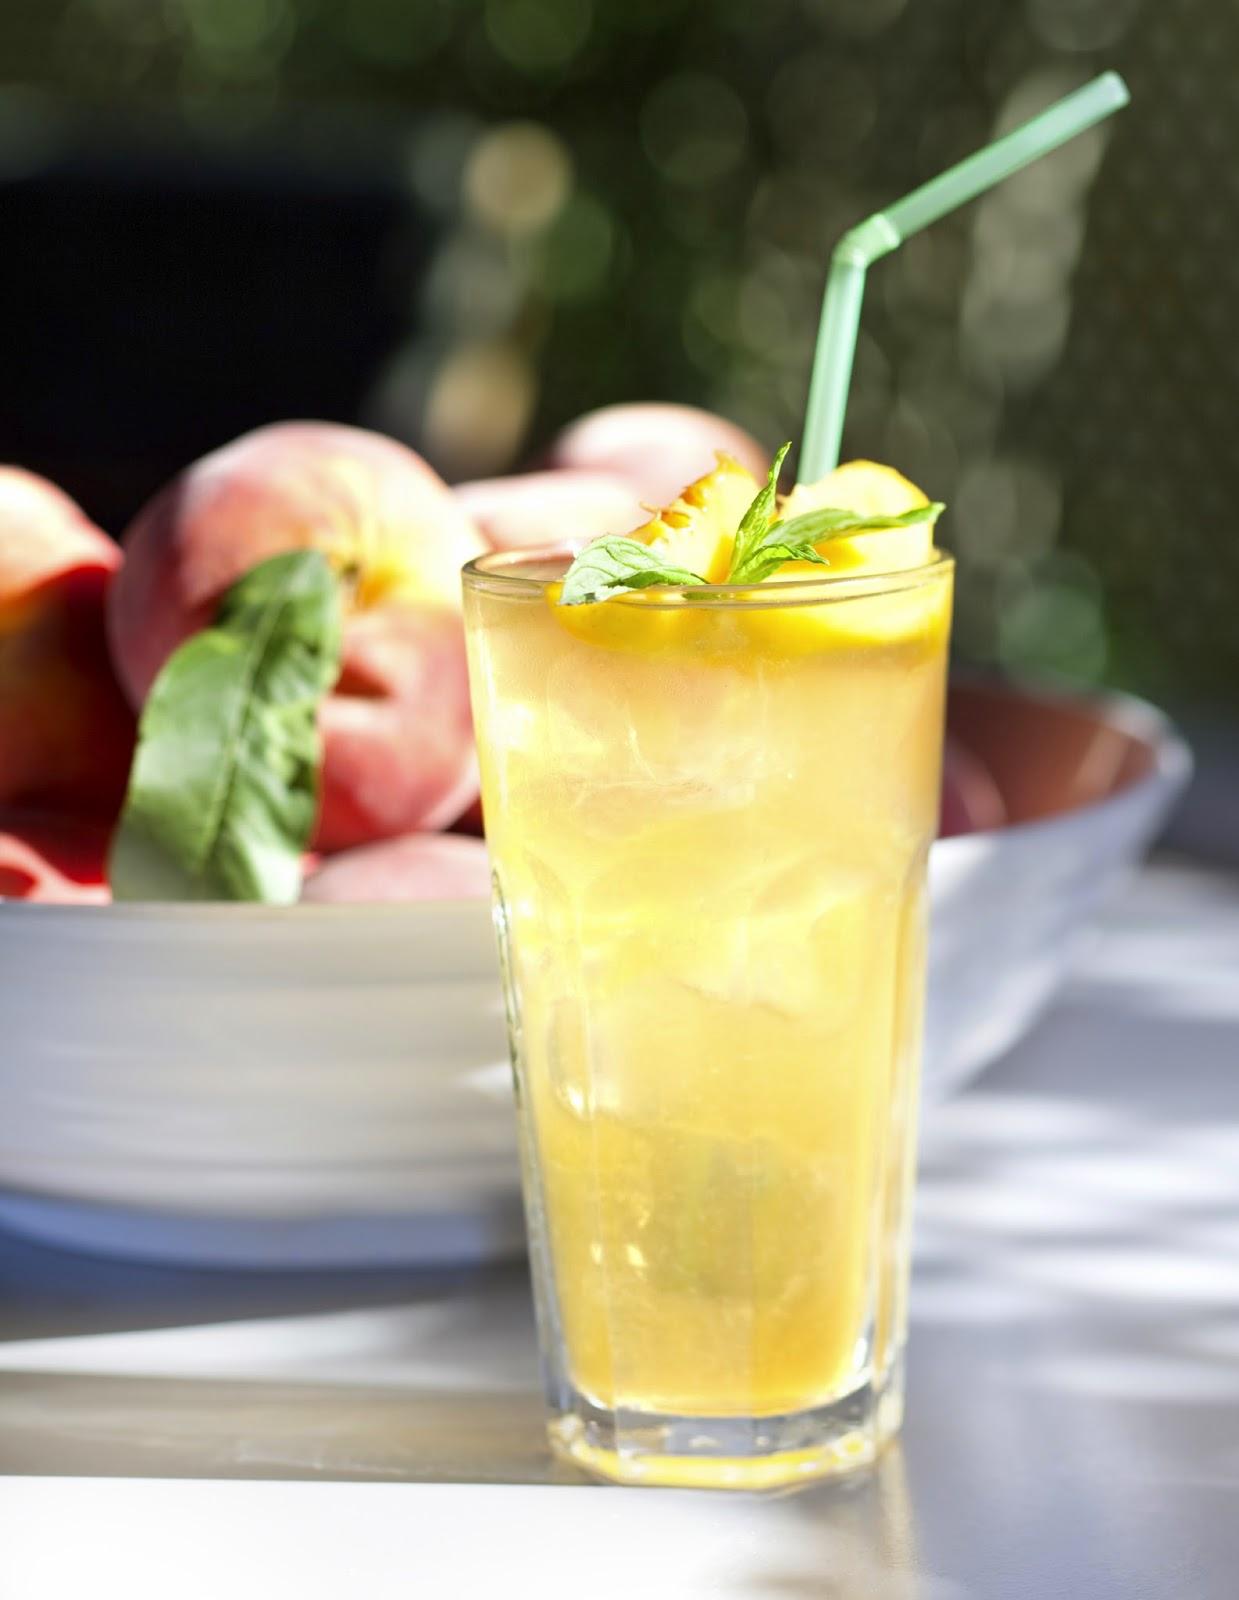 we got the idea for this delicious homemade peaches u0026 cream soda recipe for sodastreams from our love of cream soda and fresh peaches - Sodastream Reviews